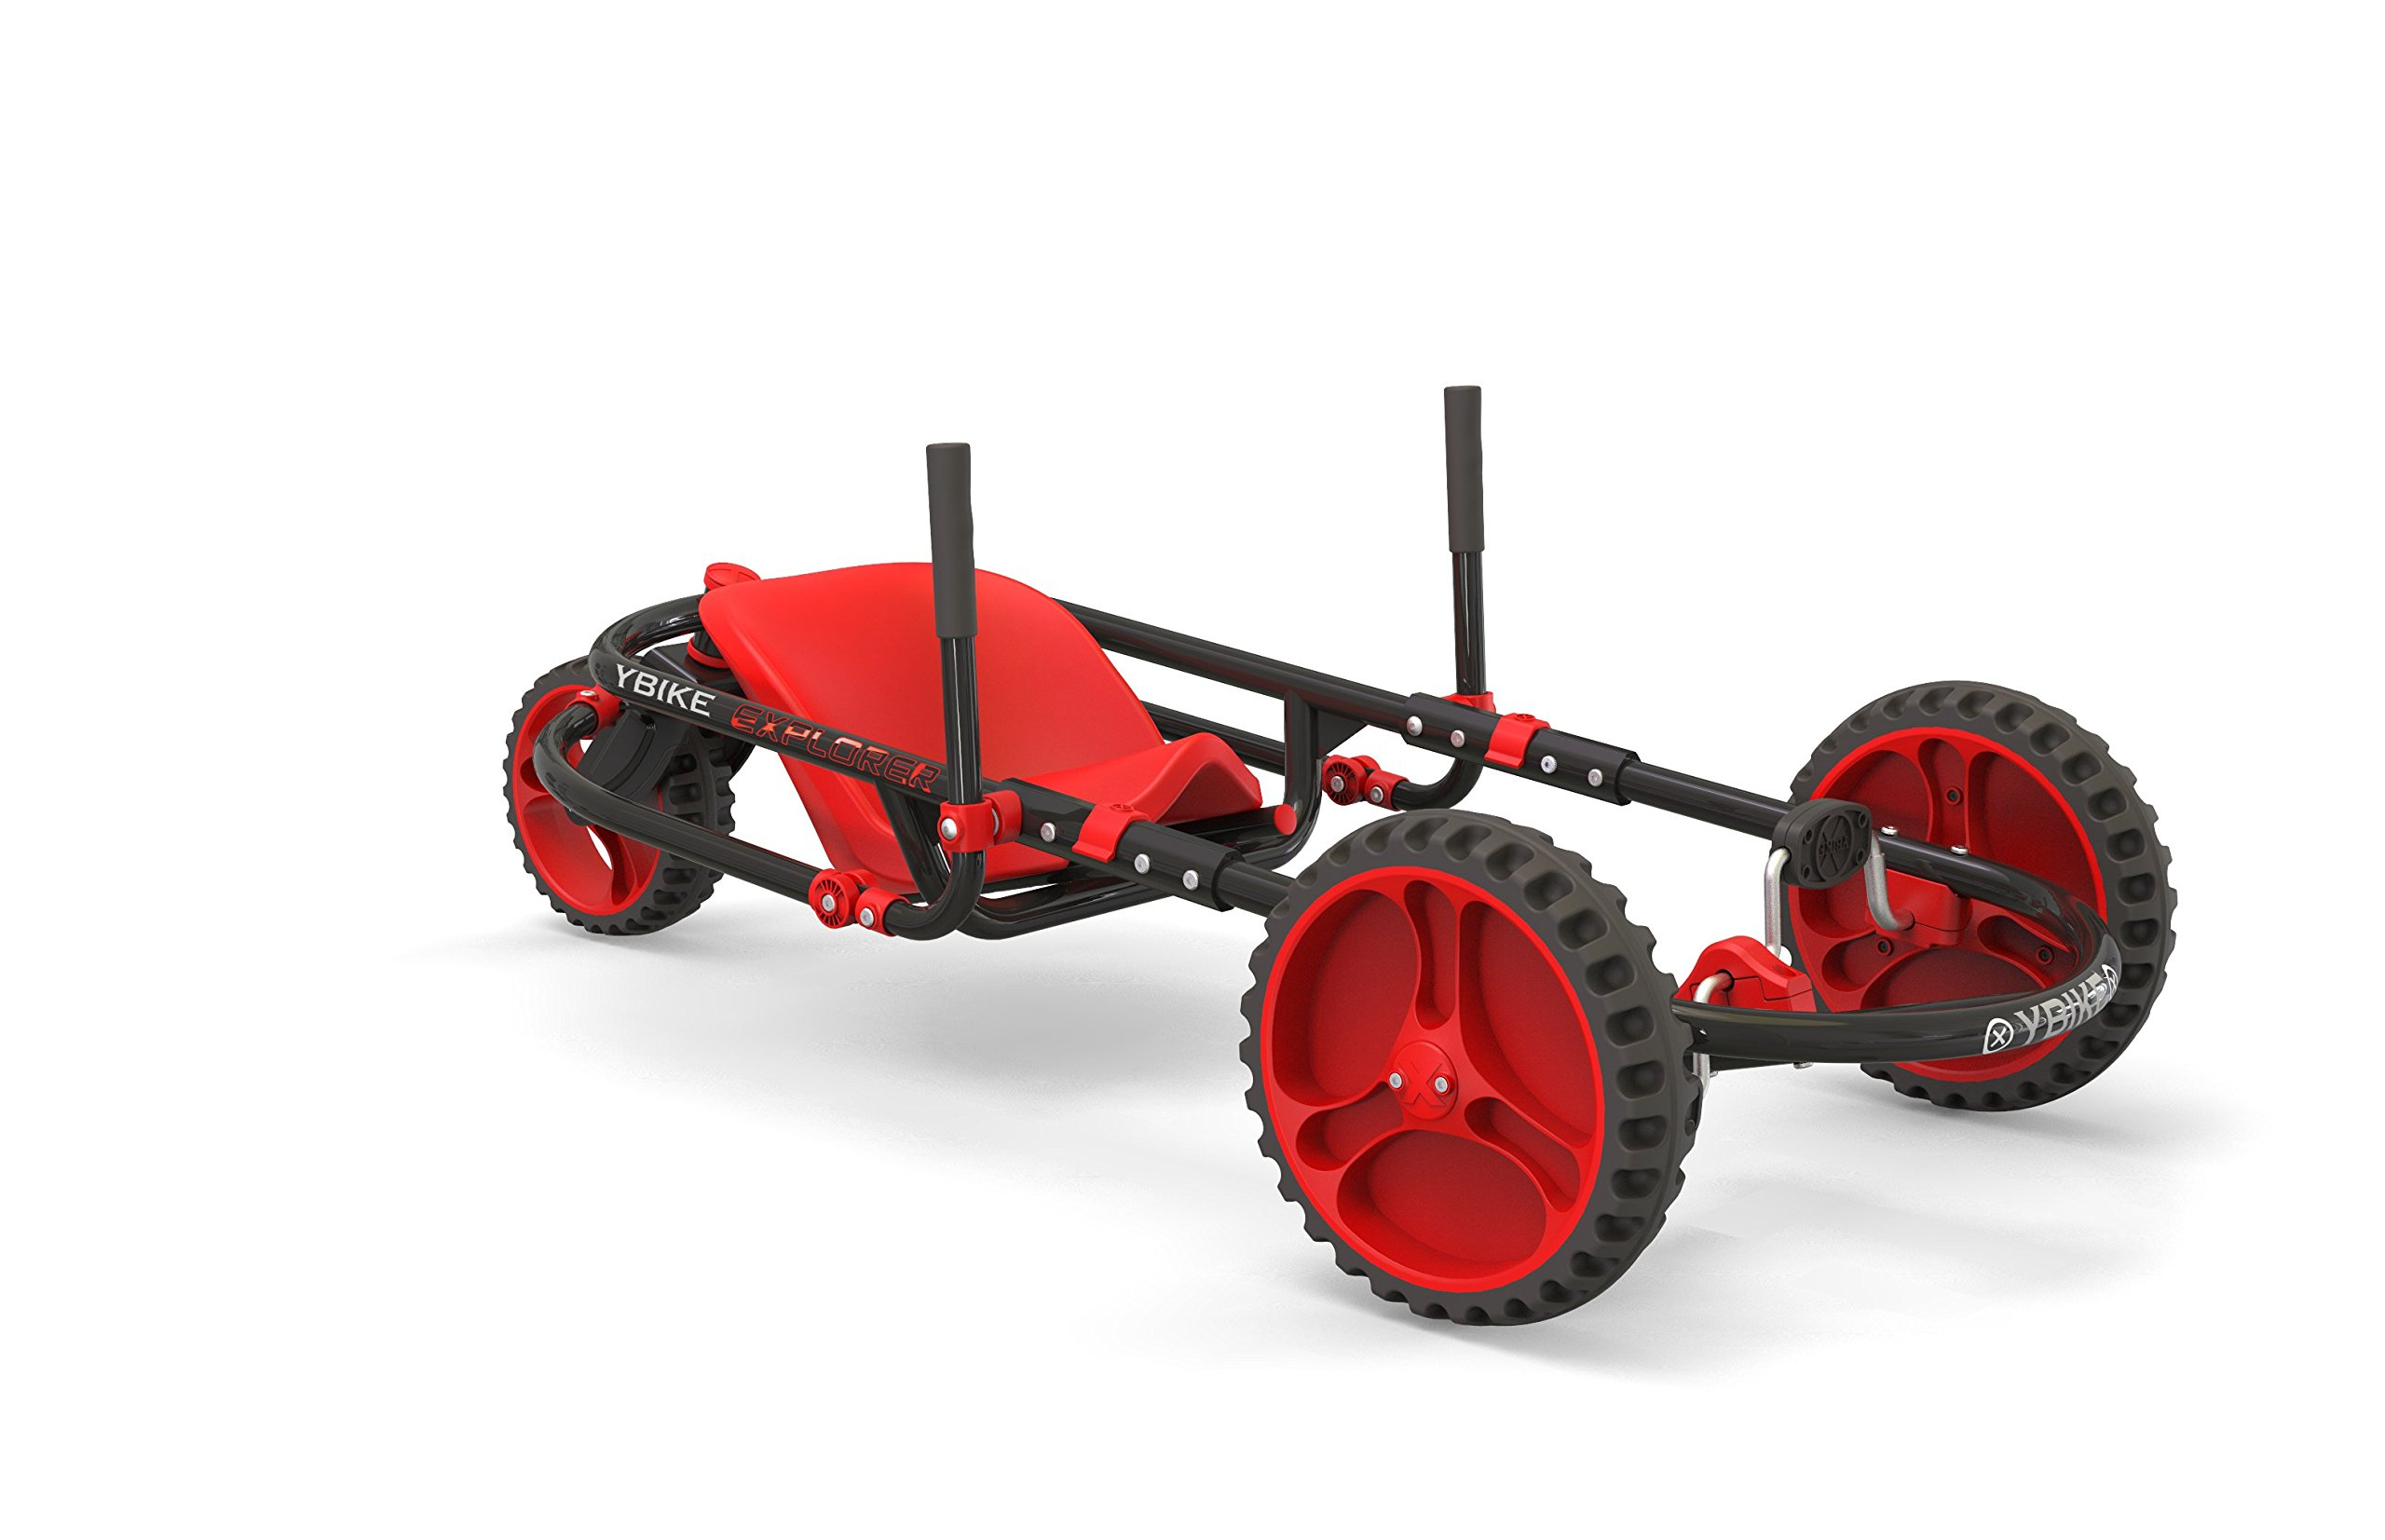 YBIKE Explorer Pedal Car, Red/Black by YBIKE